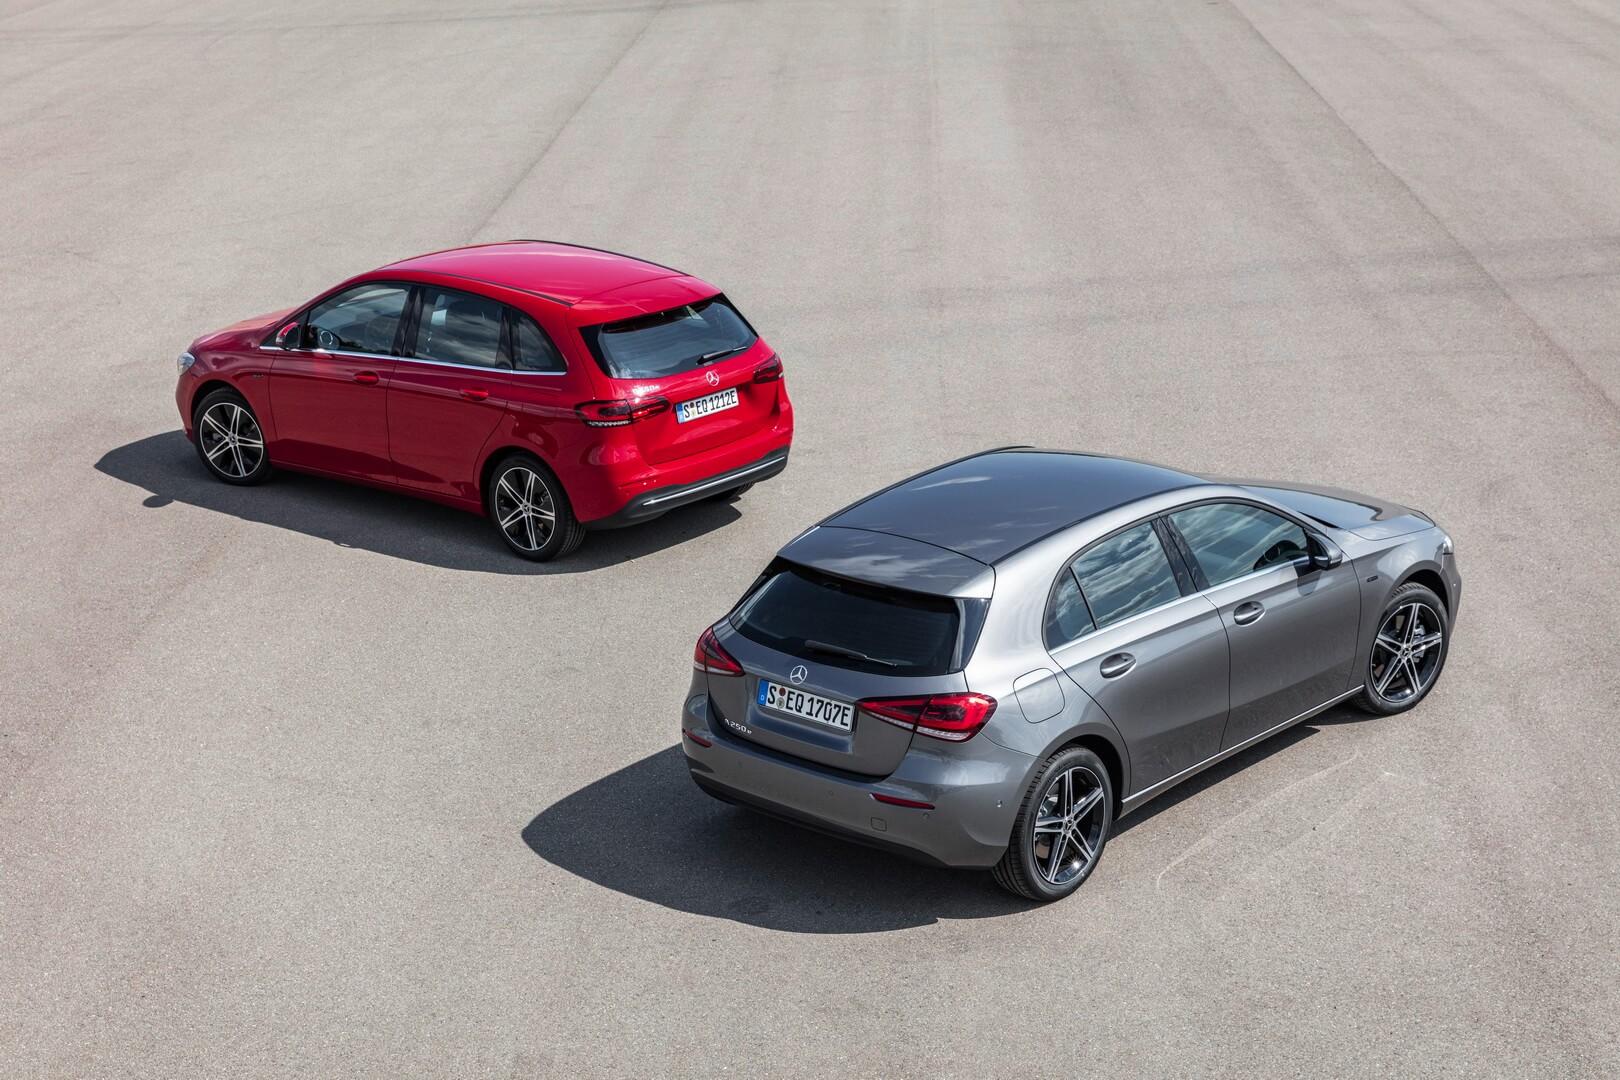 Mercedes-Benz представляет плагин-гибриды A250e и B250e